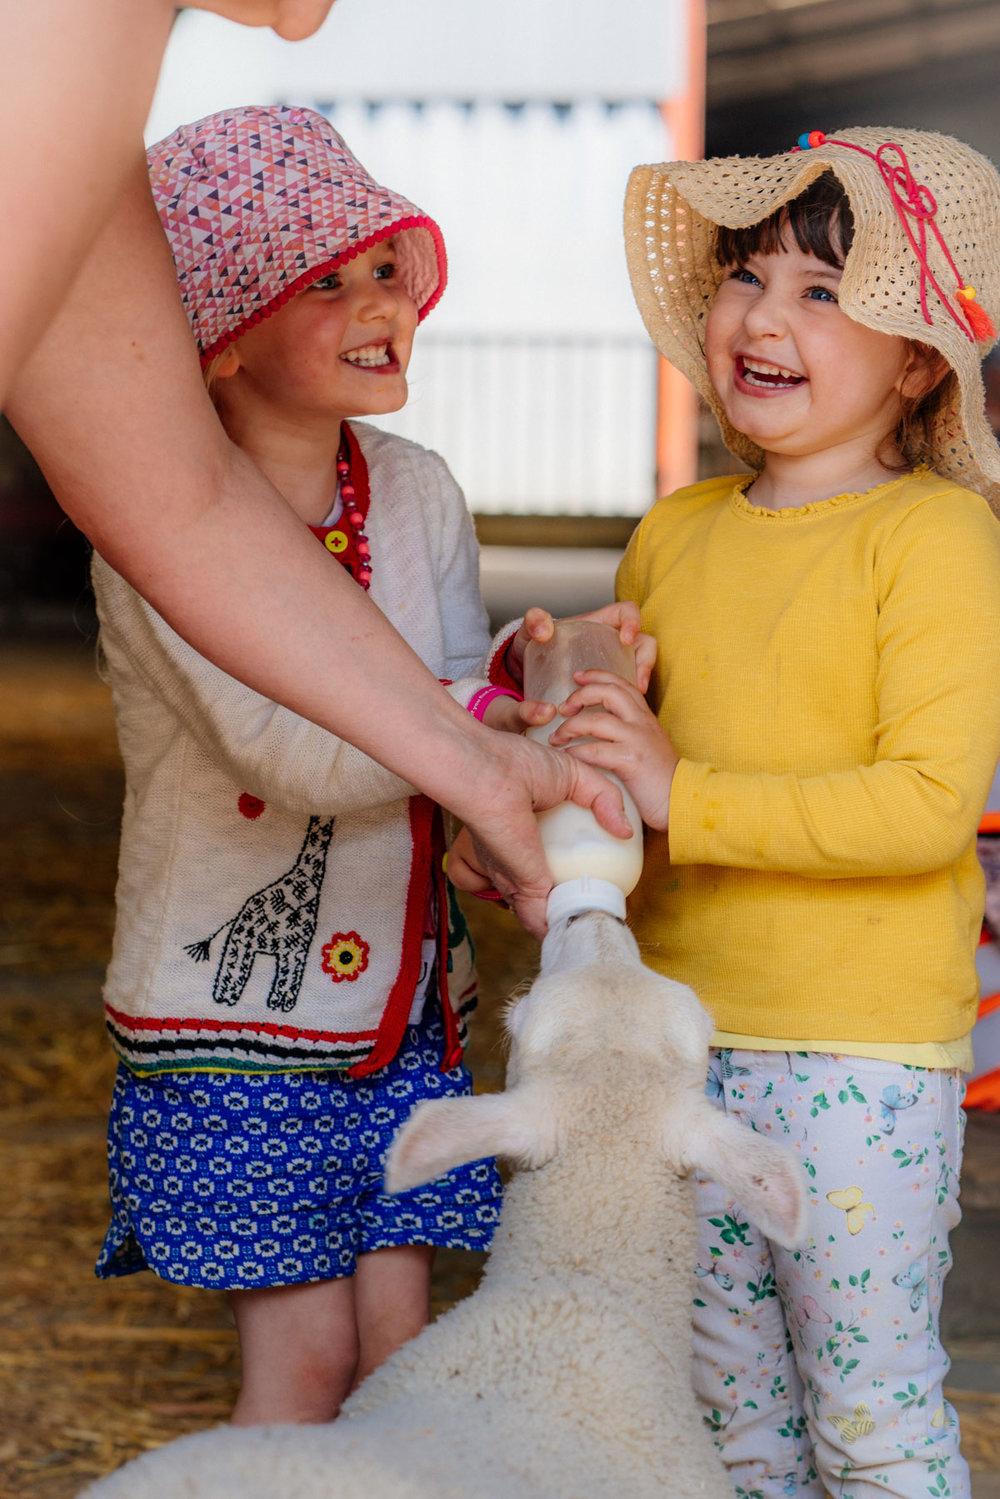 warleigh-lodge-farm-shirehampton-2018-05-23---128-128.jpg